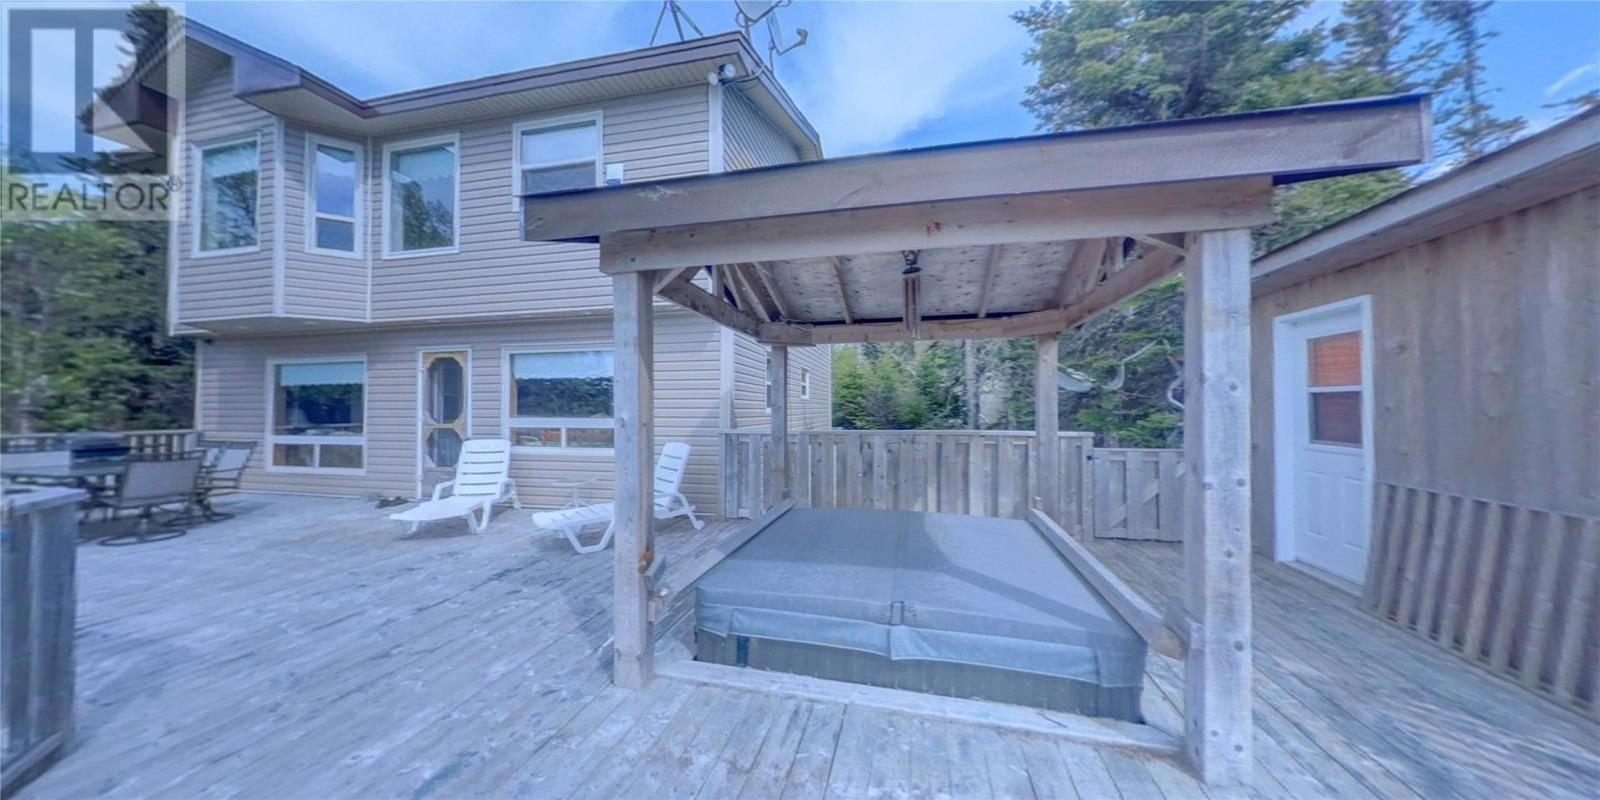 Home for sale at 0 Jacks Pond Rd Unit 2 Brigus Jct Newfoundland - MLS: 1198209